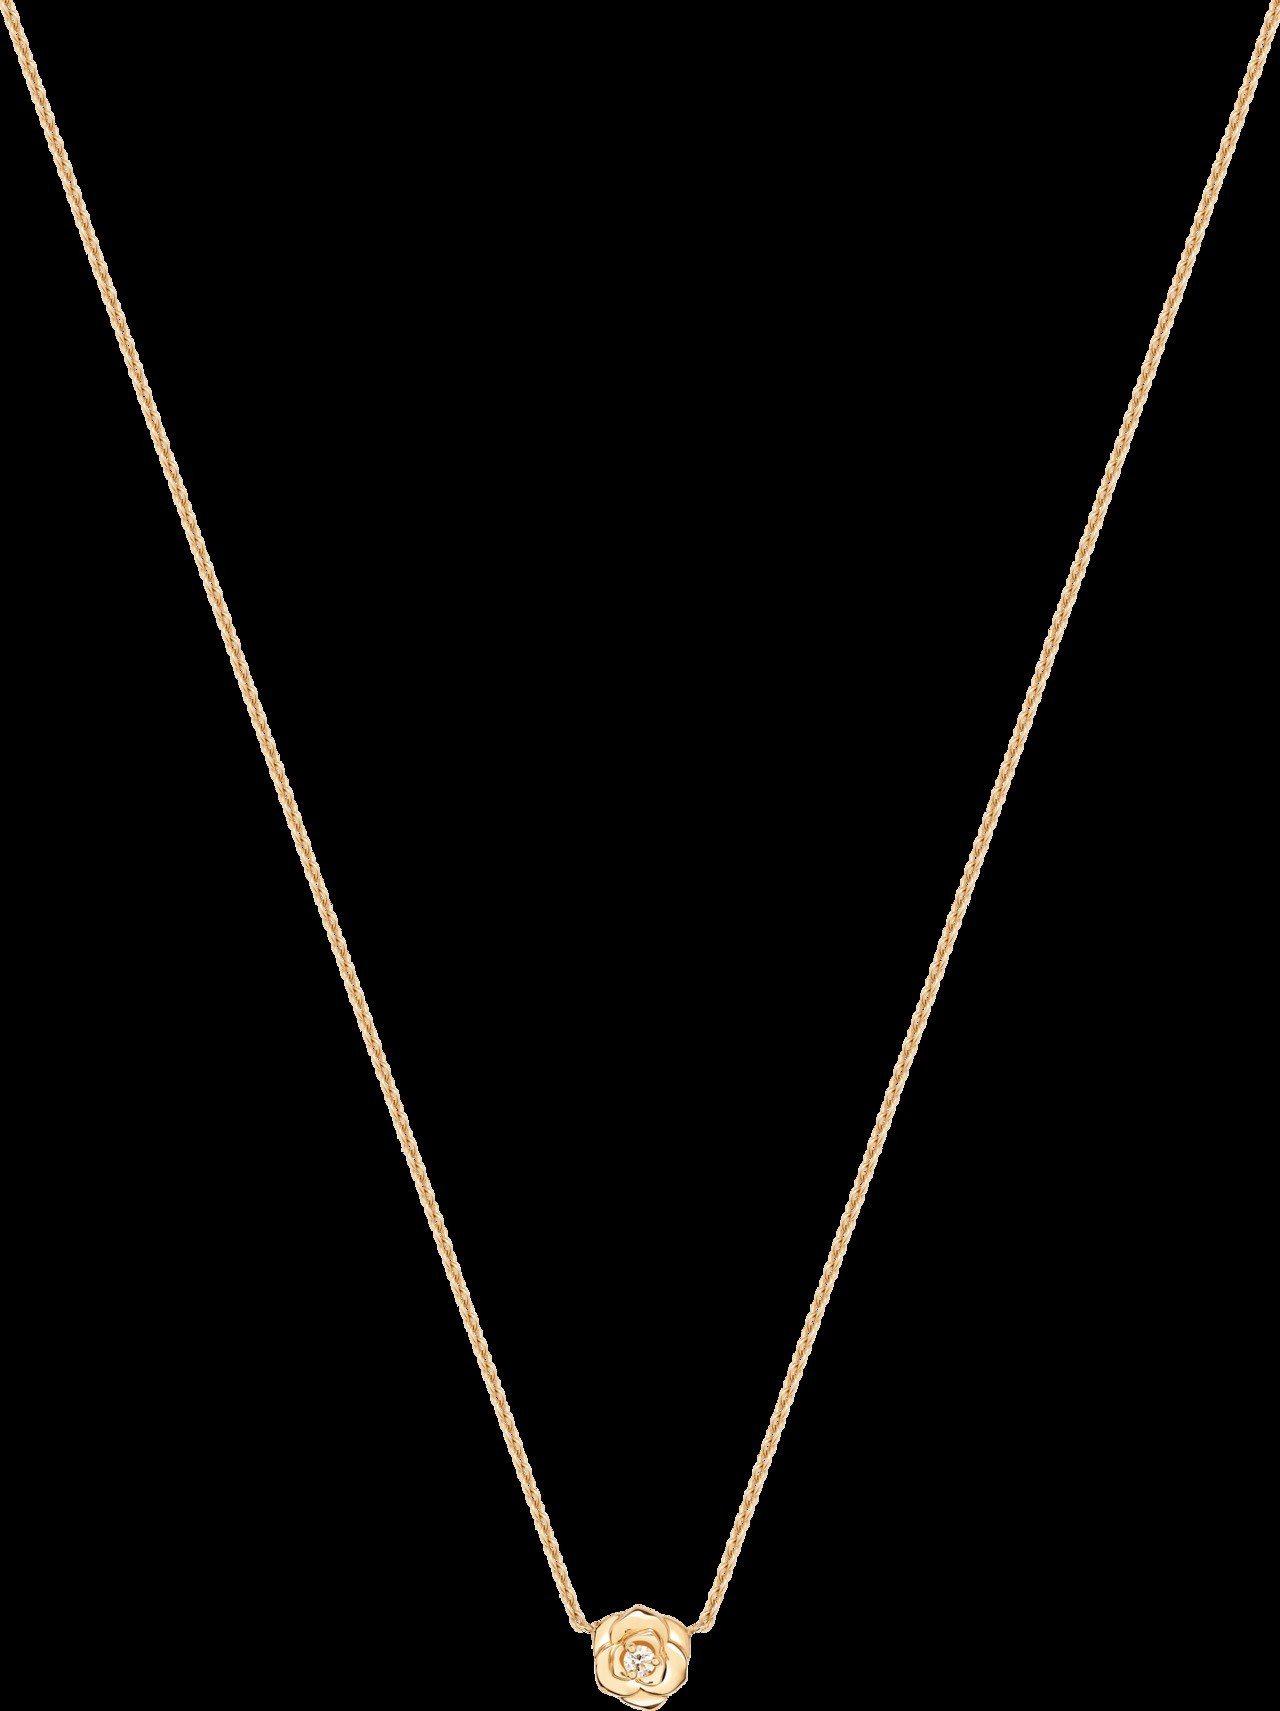 Piaget Rose系列項鍊,18K玫瑰金,鑲嵌1顆圓形美鑽約0.03克拉,4...